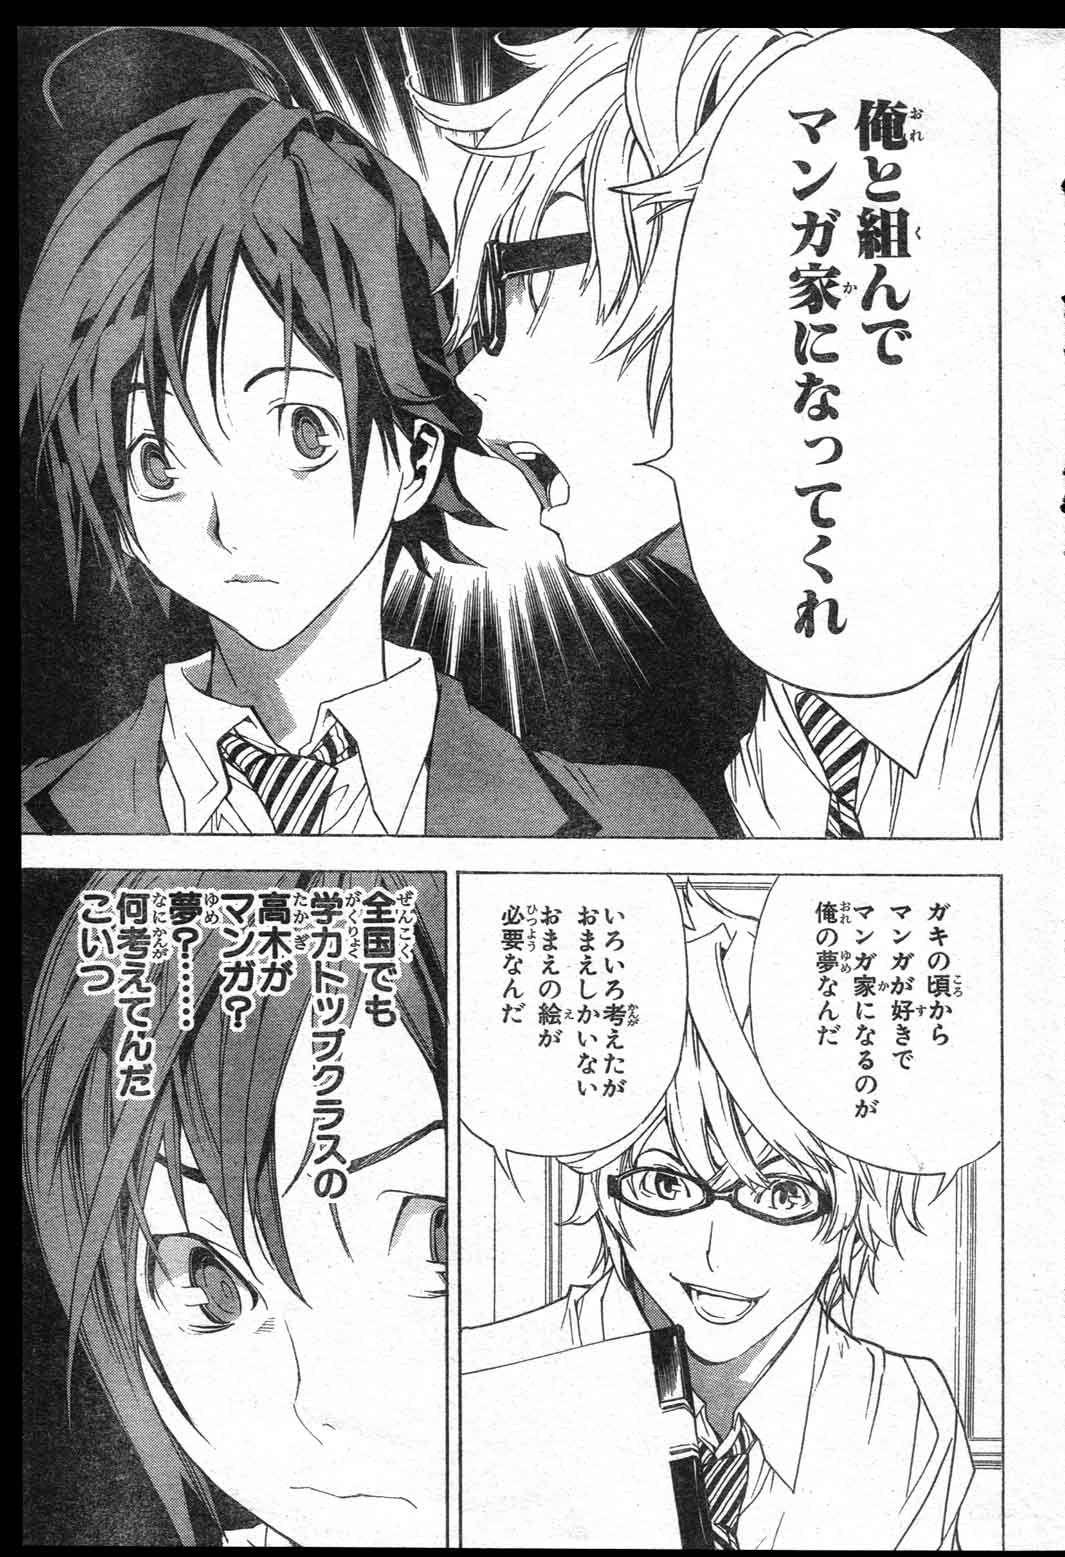 http//www.animeclick.it/prove/upload/img/News2138.jpg